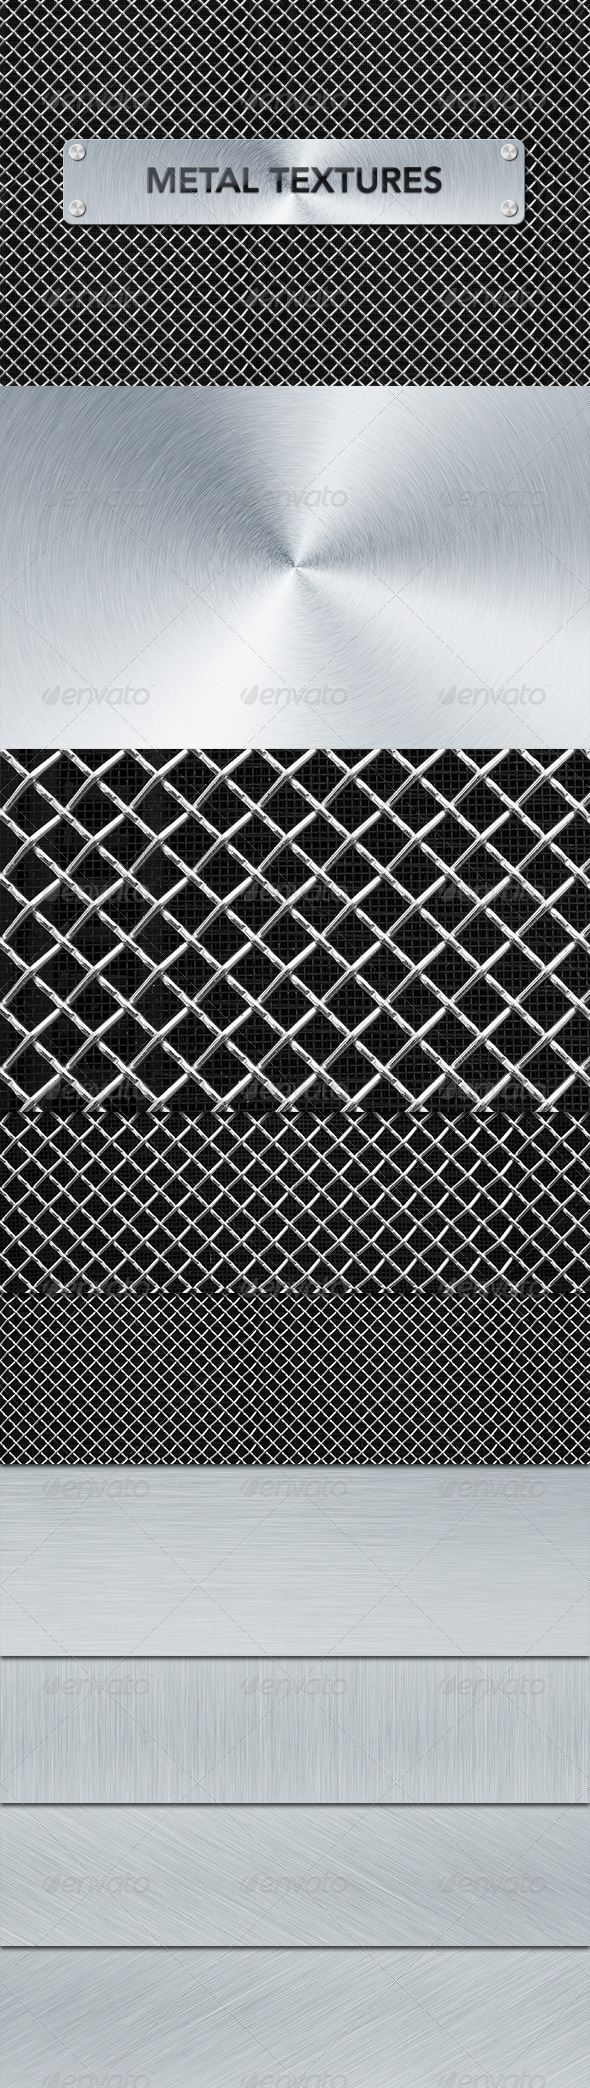 GraphicRiver Metal Textures 4013429